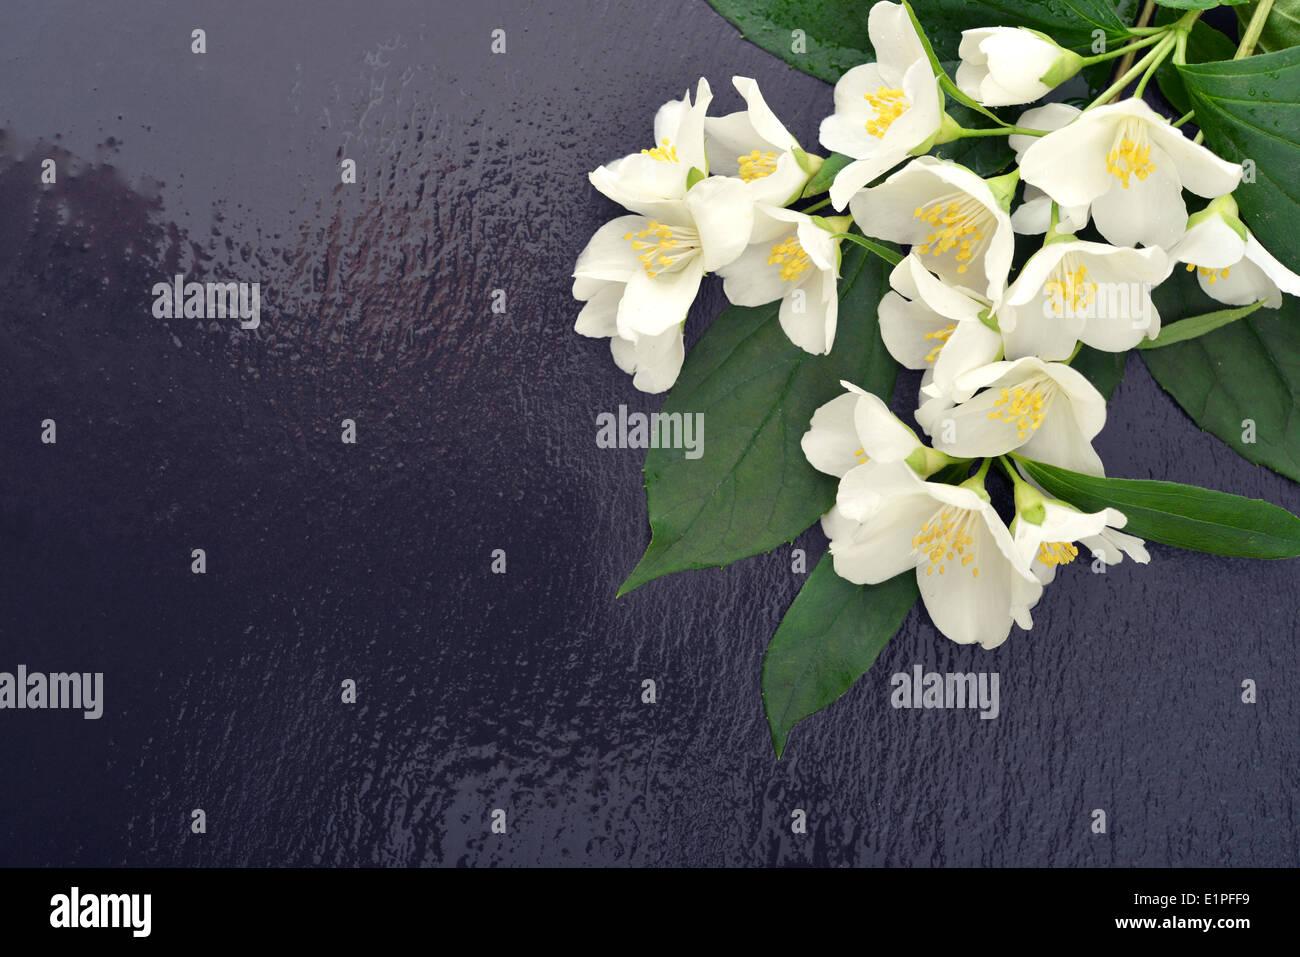 Bouquet jasmine flowers on wet stock photos bouquet jasmine bouquet of jasmine flowers on wet graphite background stock image izmirmasajfo